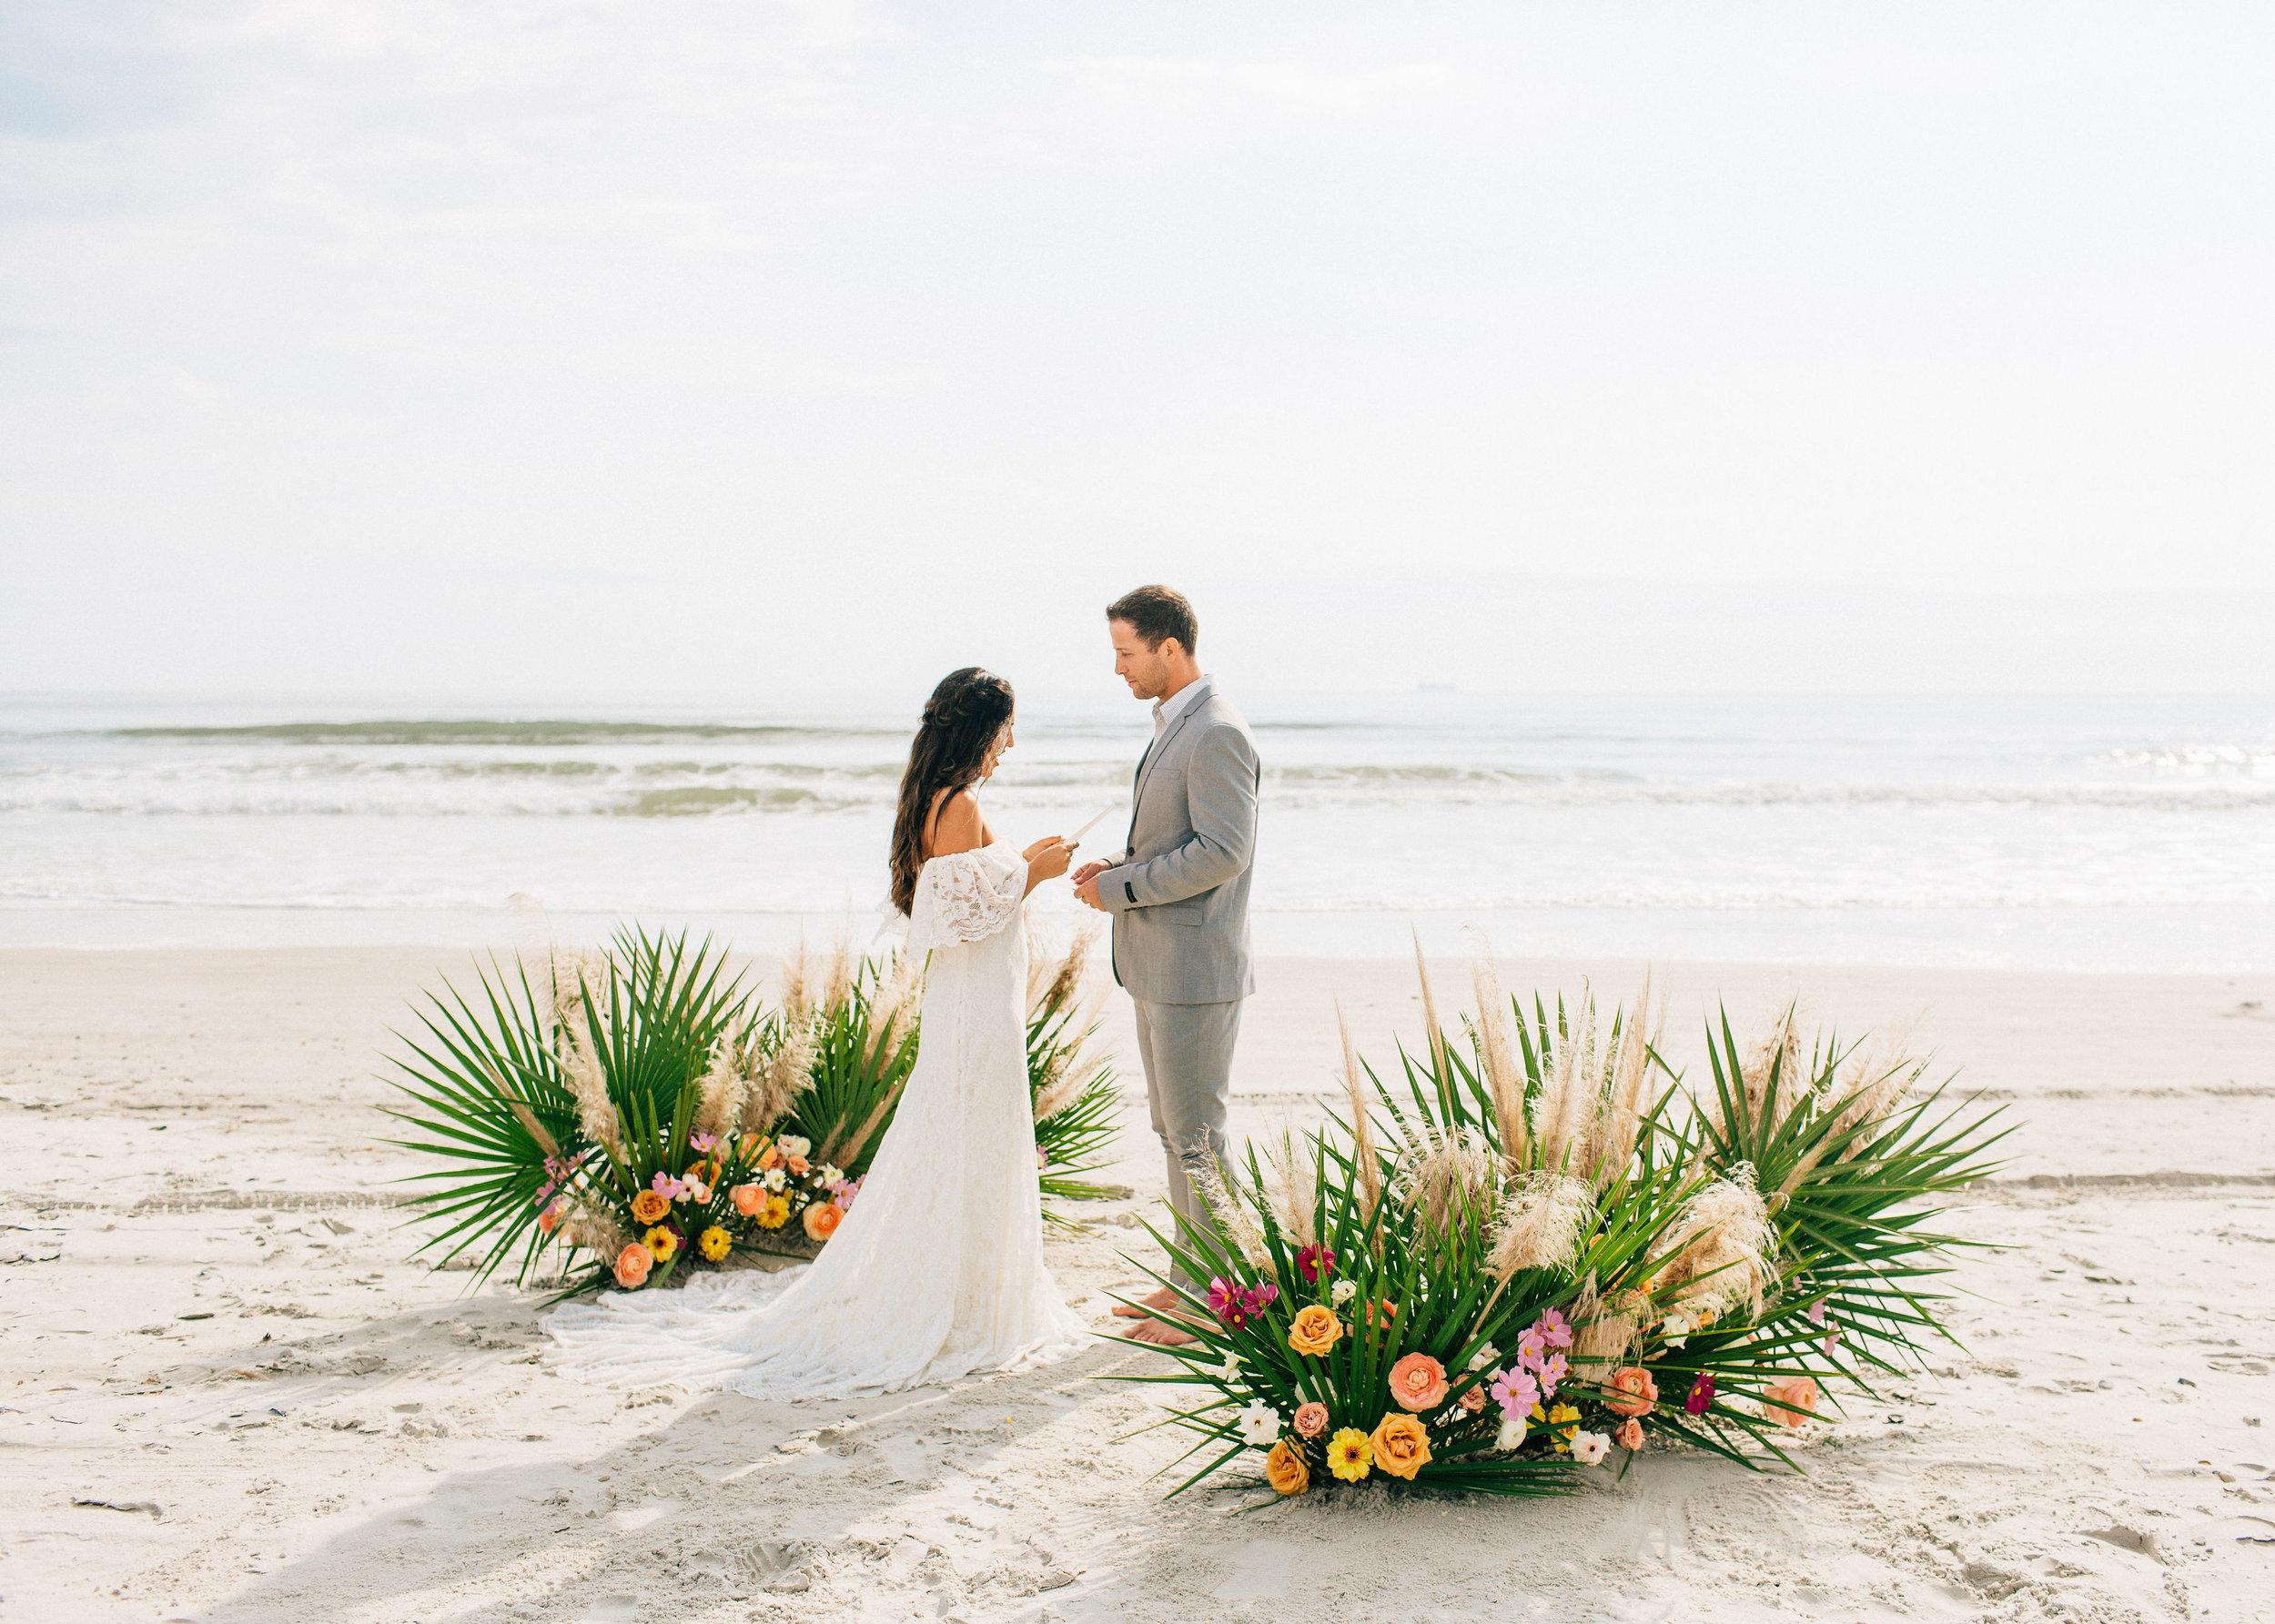 beach wedding - beach bride - elopement - savannah bride - savannah wedding shop - boho wedding dress2.jpg